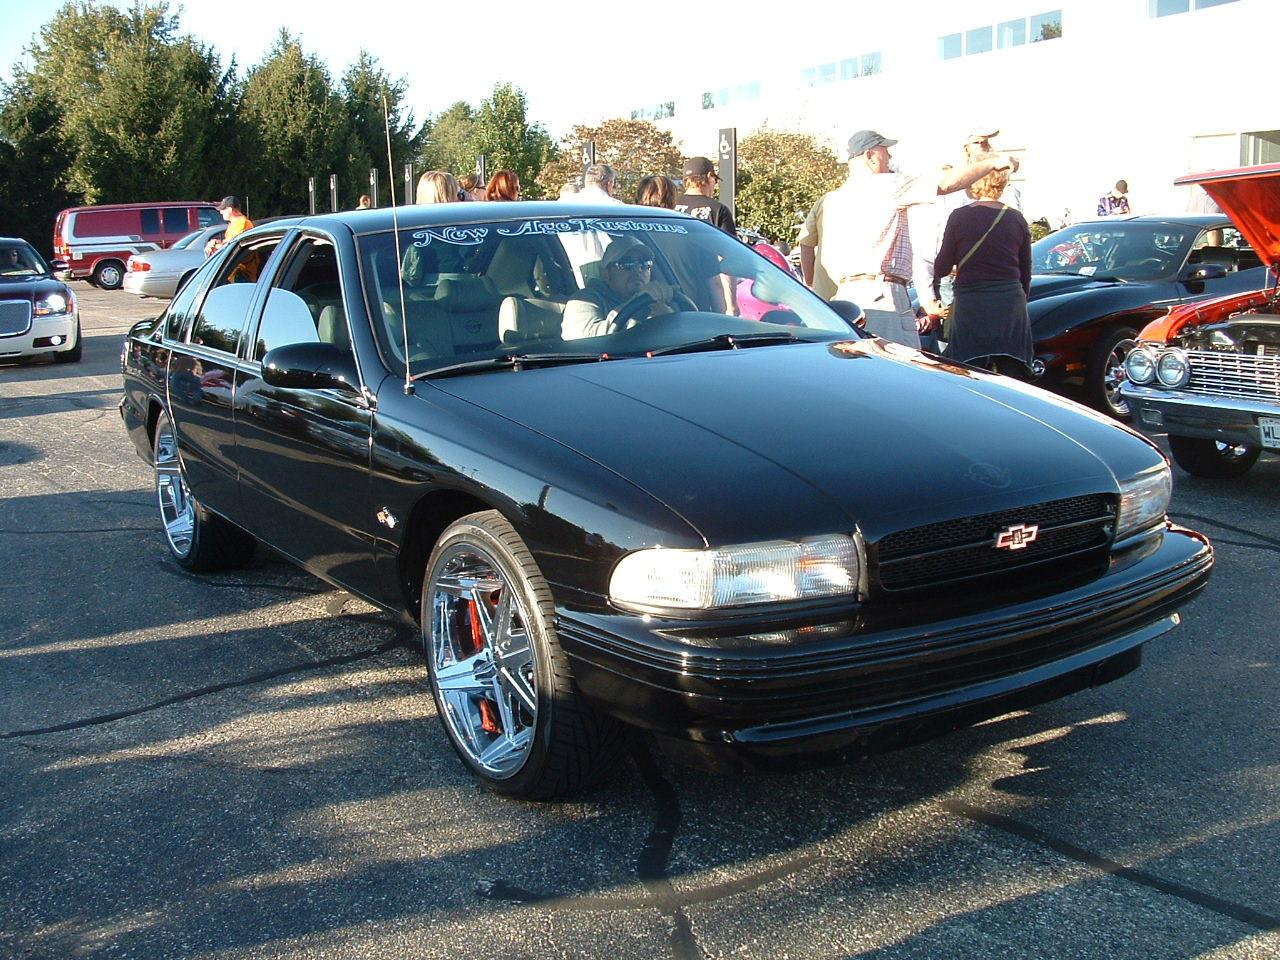 Black+64+impala+lowrider